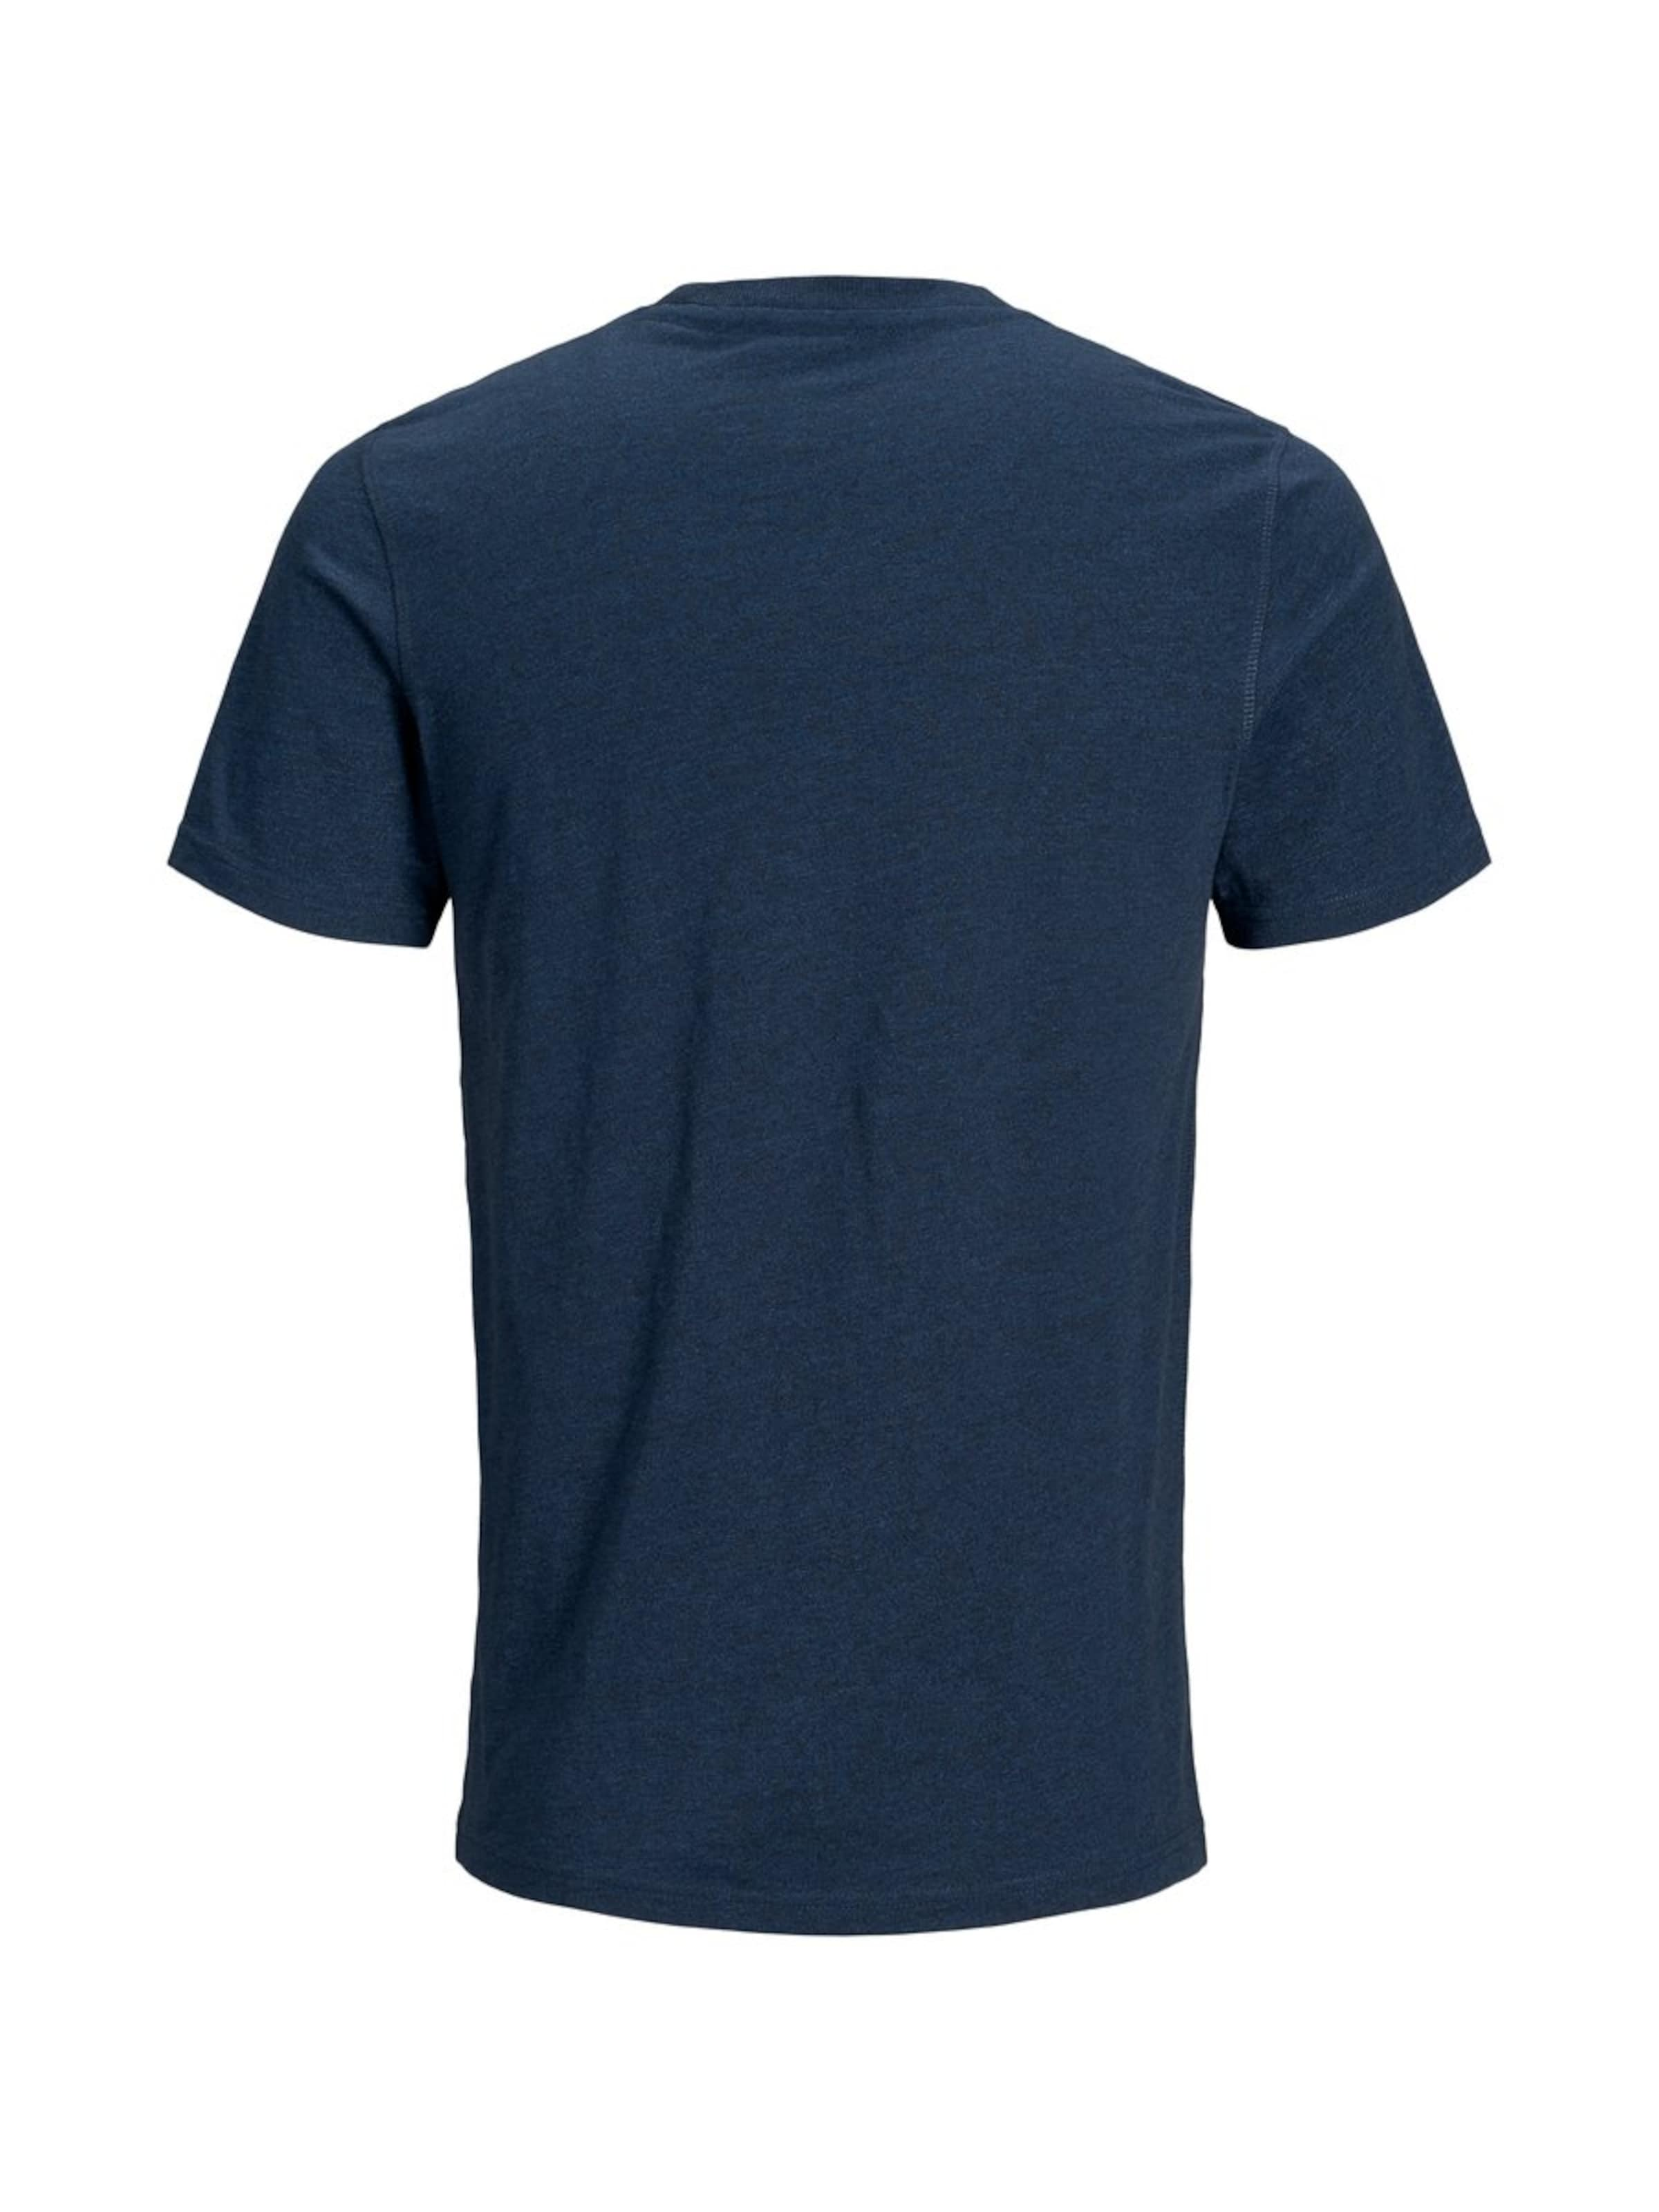 En Bleu Blanc Jones shirt T Jackamp; NuitJaune ygbY7f6v